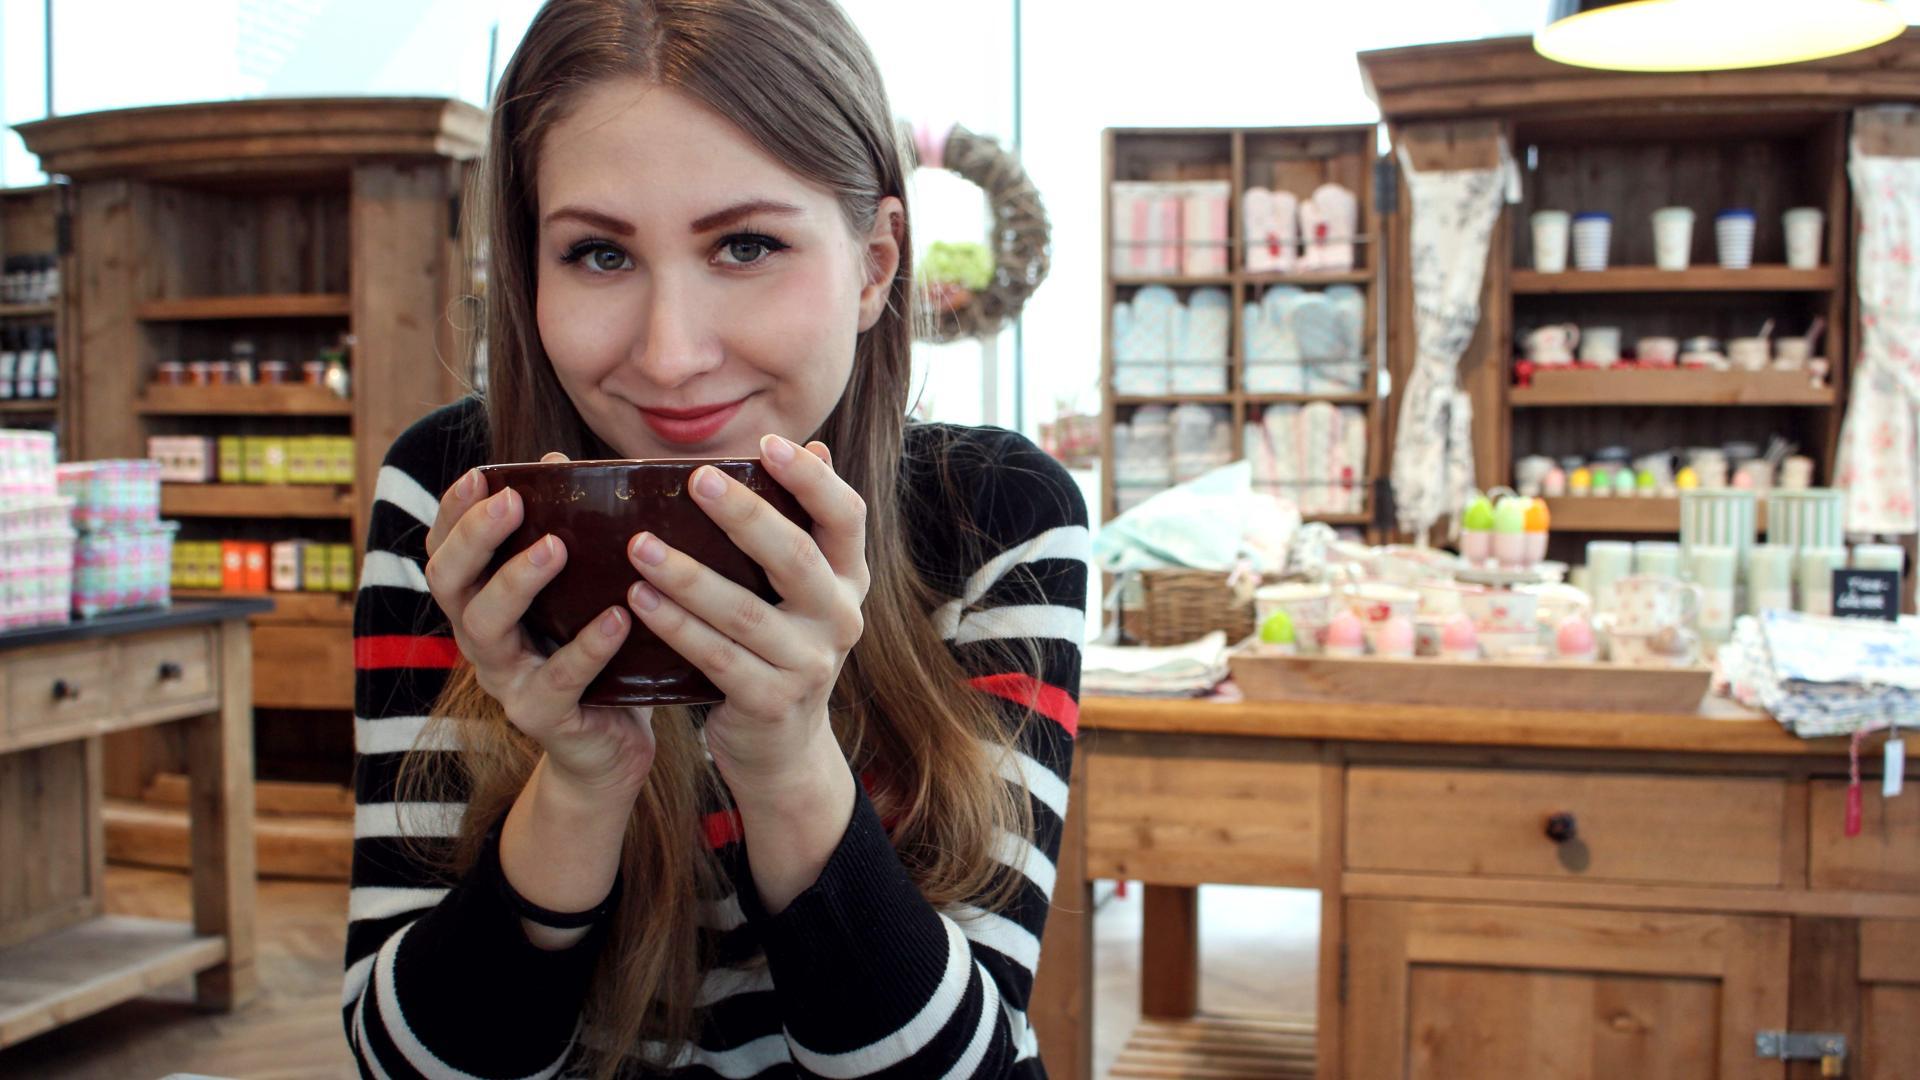 3 gute Gründe, um Kaffee zu trinken